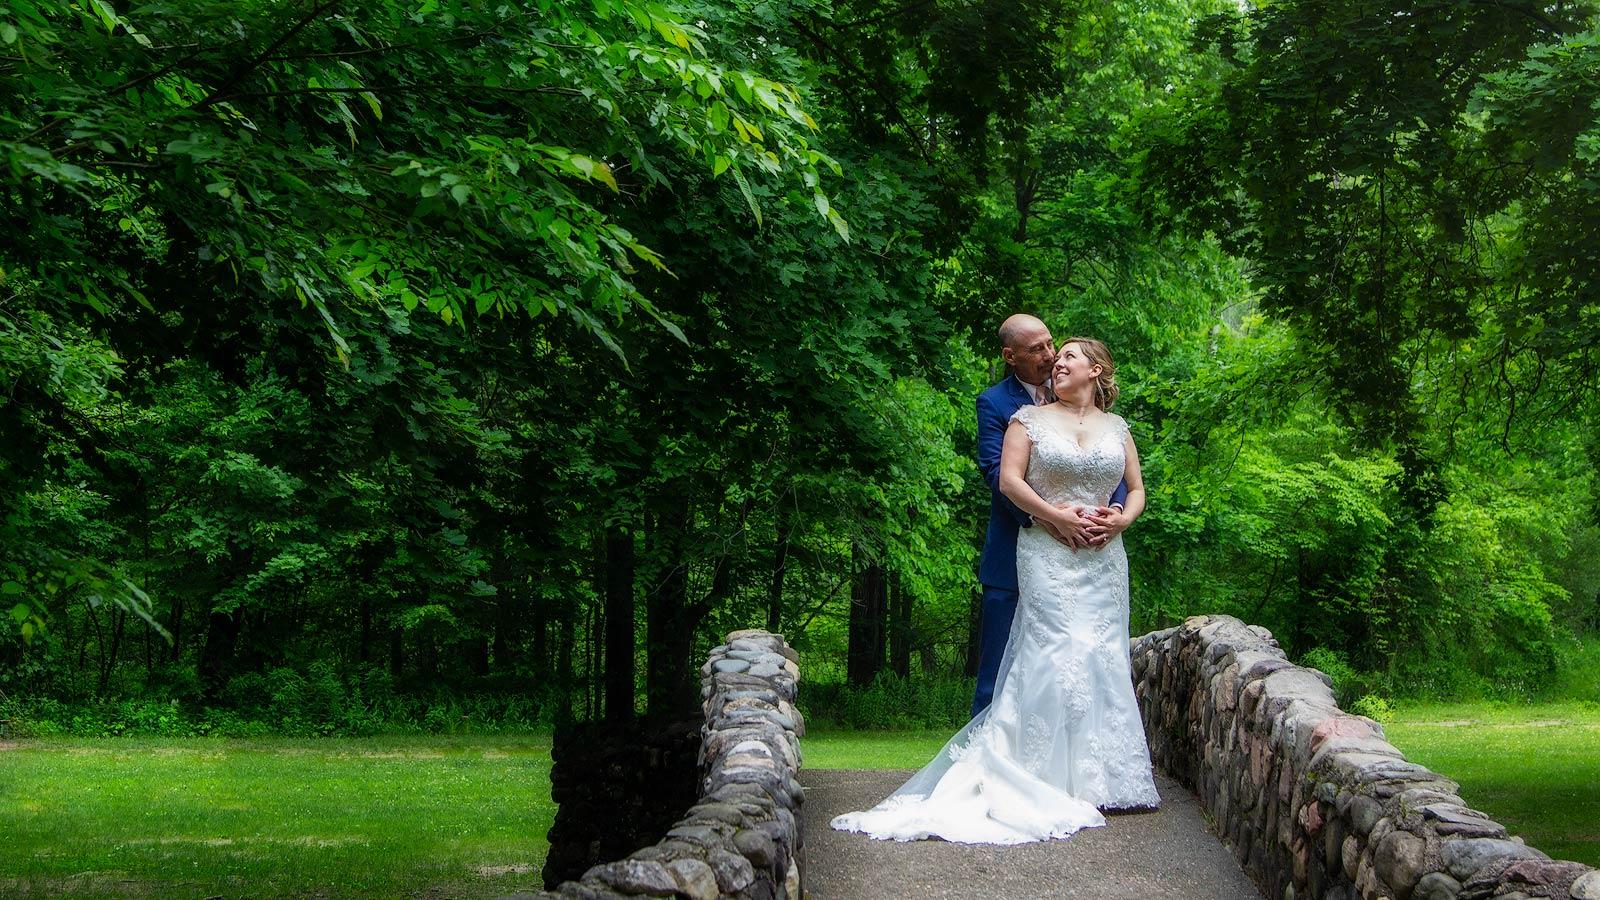 Wedding Photo Couple on Stone Bridge in Park